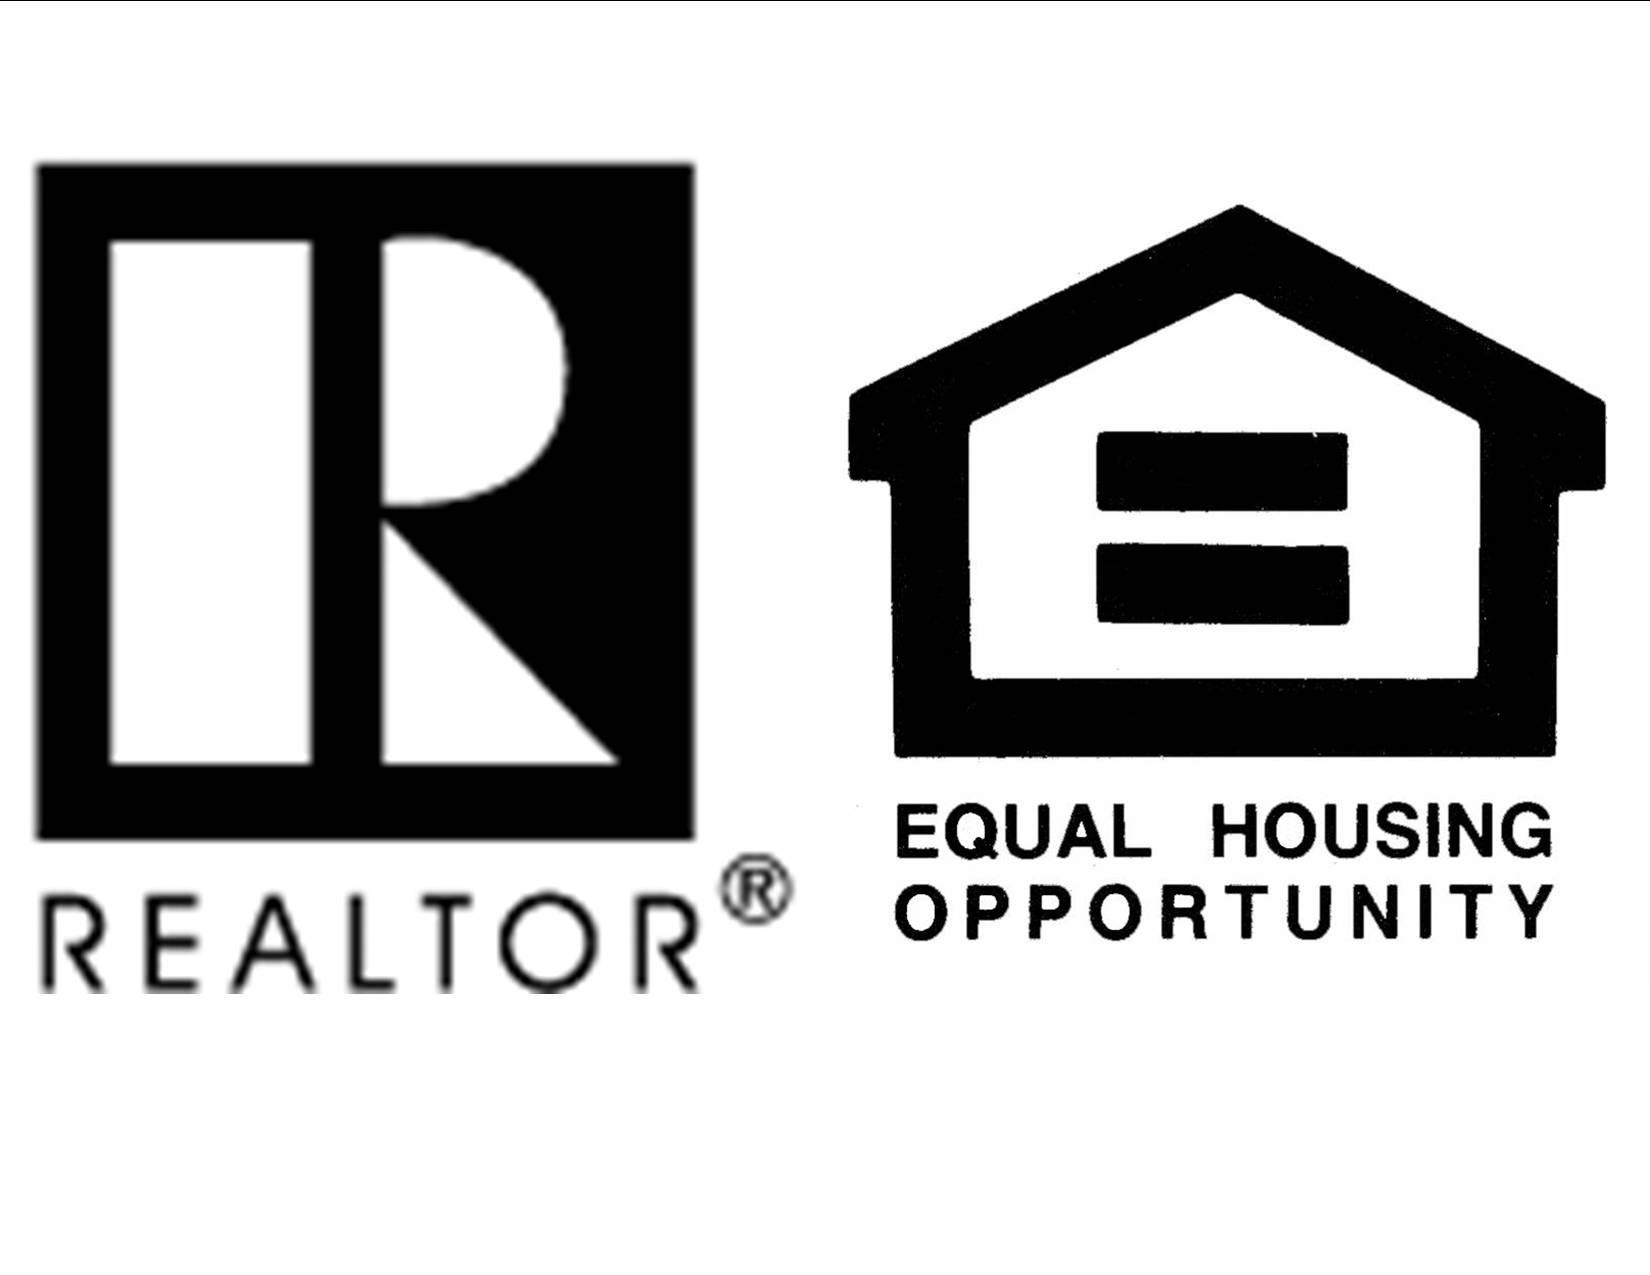 equal opportunity fair housing logo n3 free image rh pixy org equal housing opportunity logo vector white equal housing opportunity logo vector download